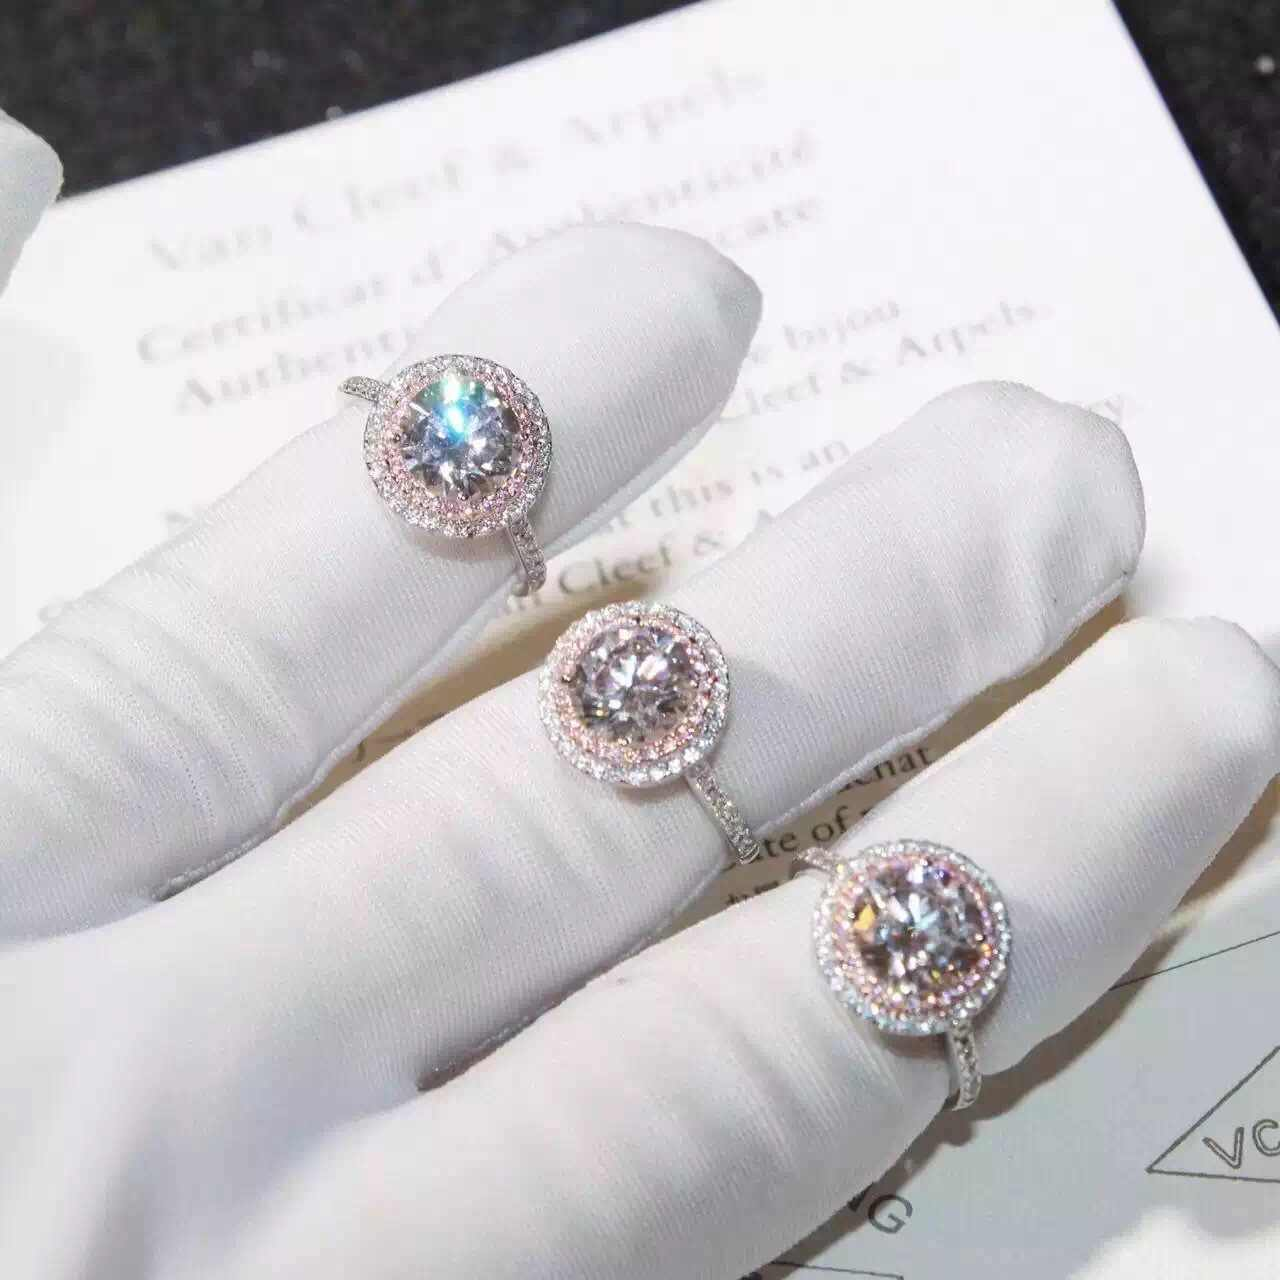 100% S925 เงินสเตอร์ลิง VS2 เพชรแหวน Anillos แสตมป์ 925 Bizuteria Topaz อัญมณีงานแต่งงานเงิน 925 เครื่องประดับแหวน